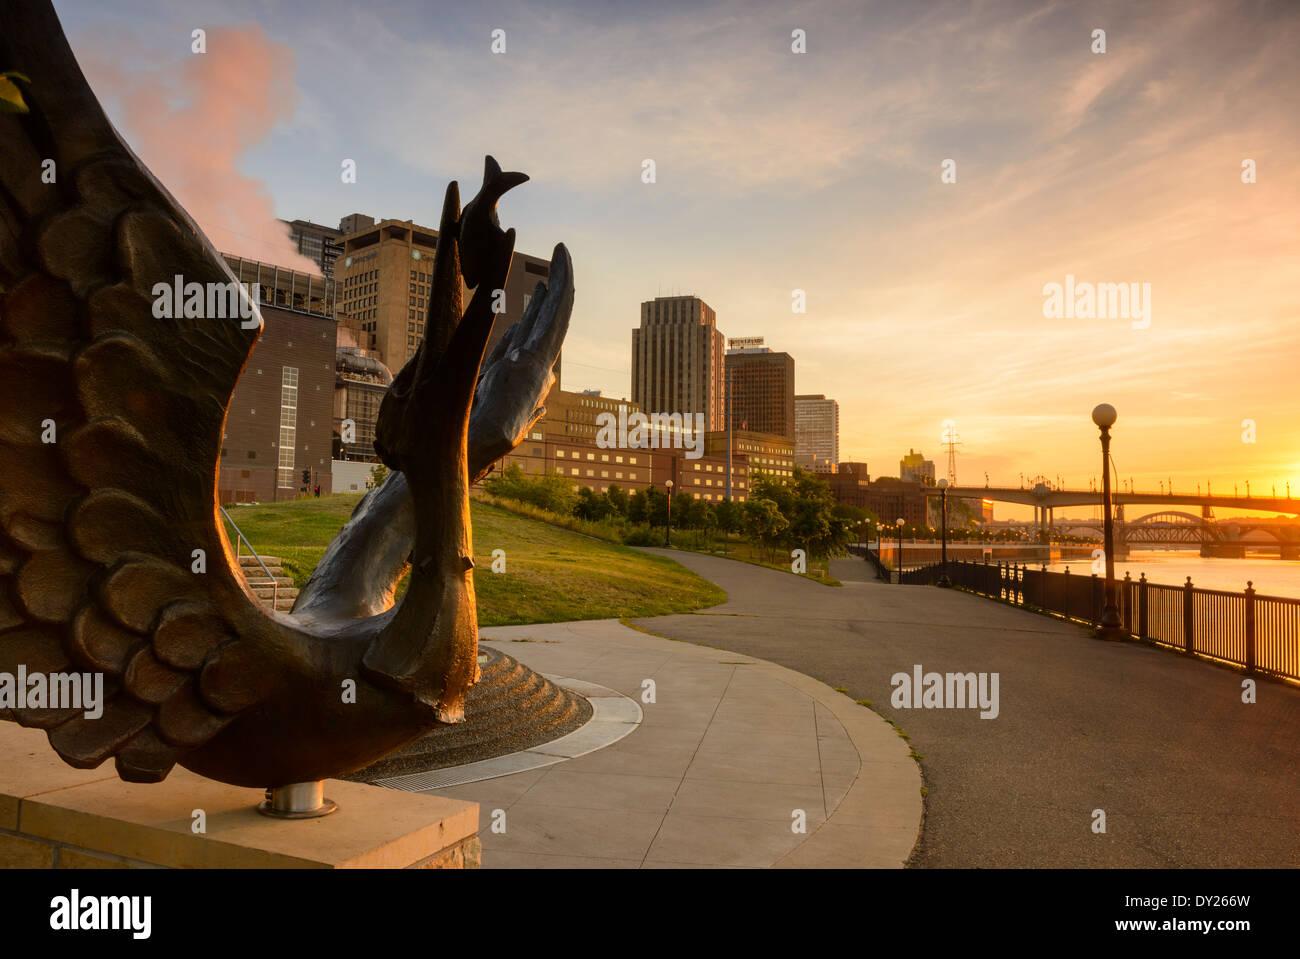 Sculpture along the Mississippi River at Upper Landing Park downtown Saint Paul, Minnesota. - Stock Image